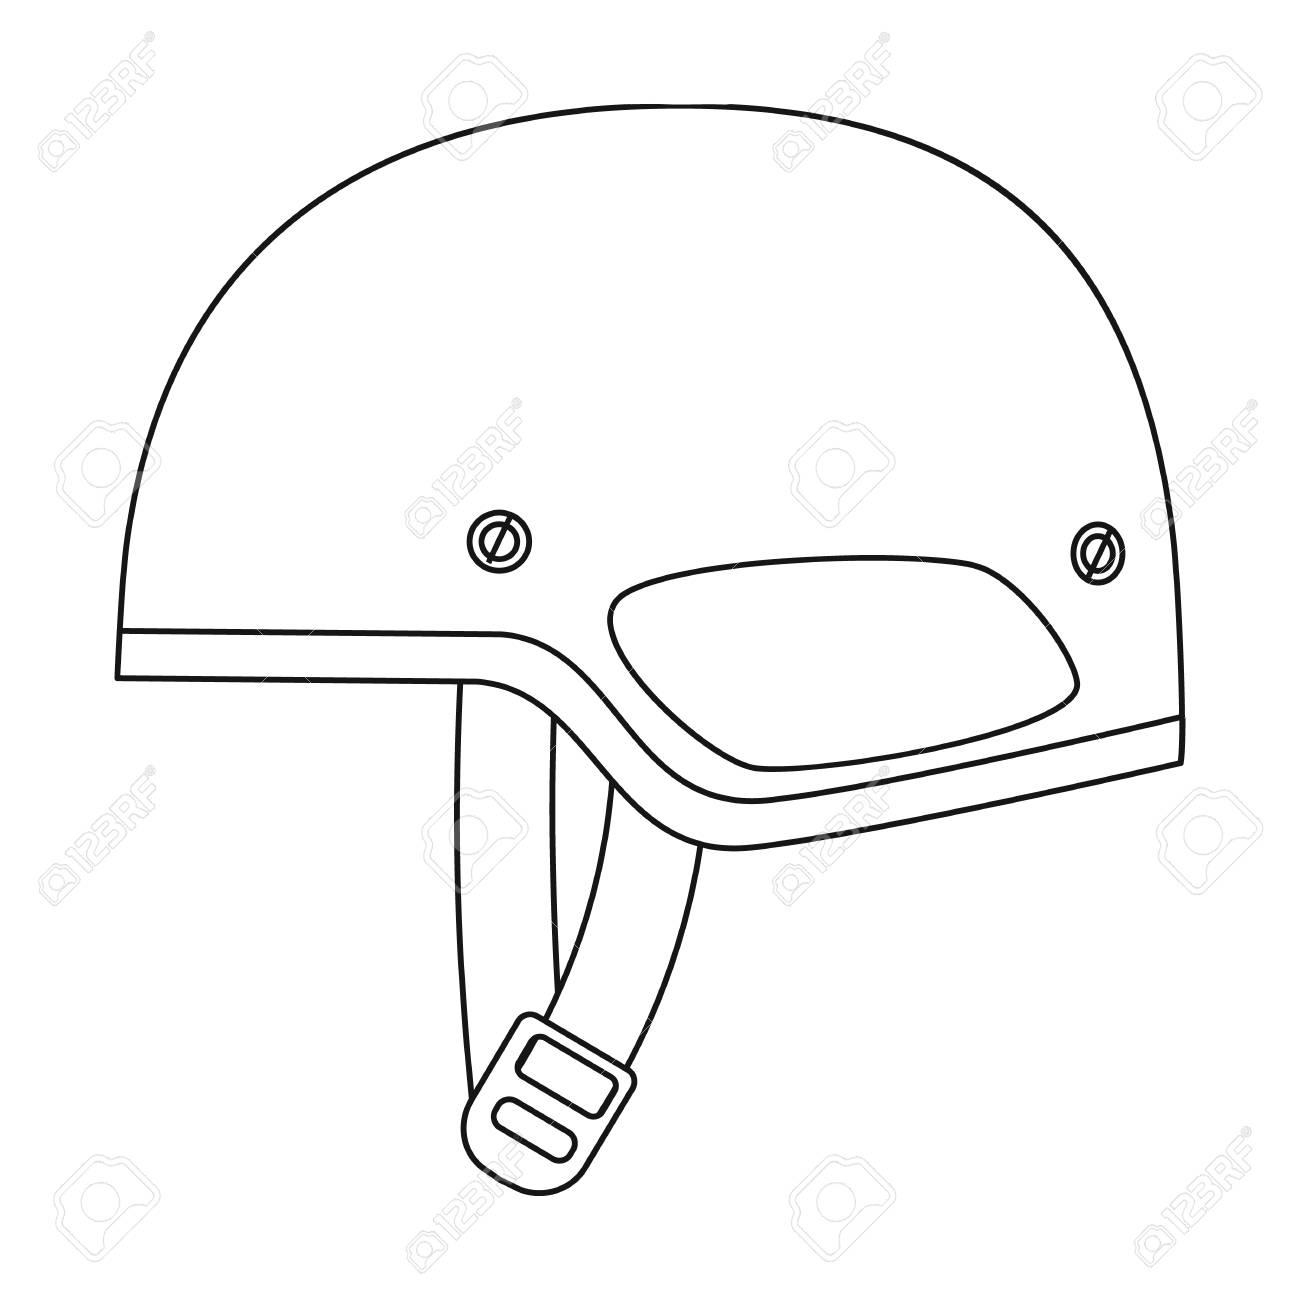 95 Army Helmet free clipart.